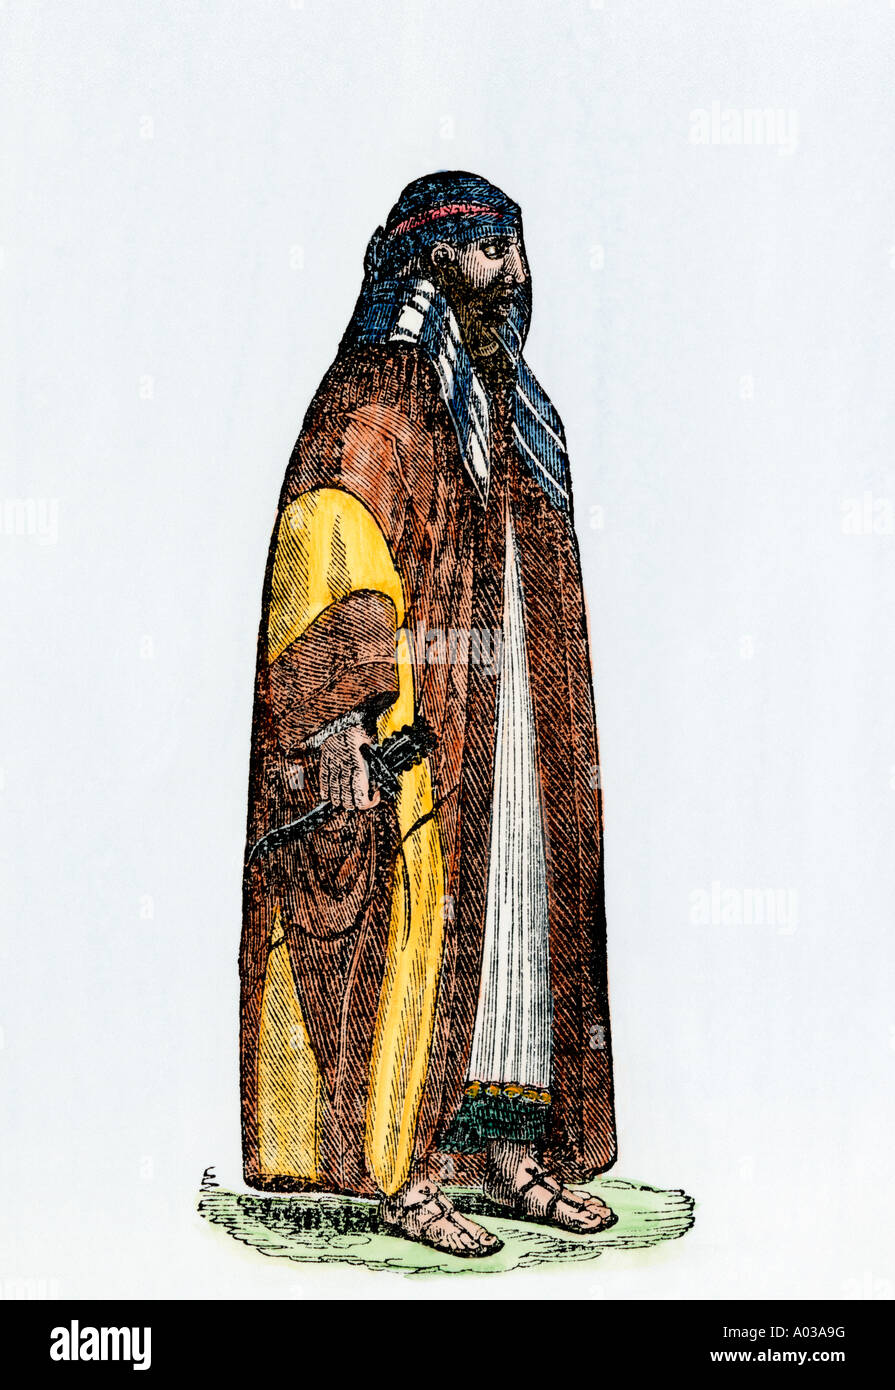 Rahmah ben Jabir a Jossamee pirate chief. Hand-colored woodcut - Stock Image